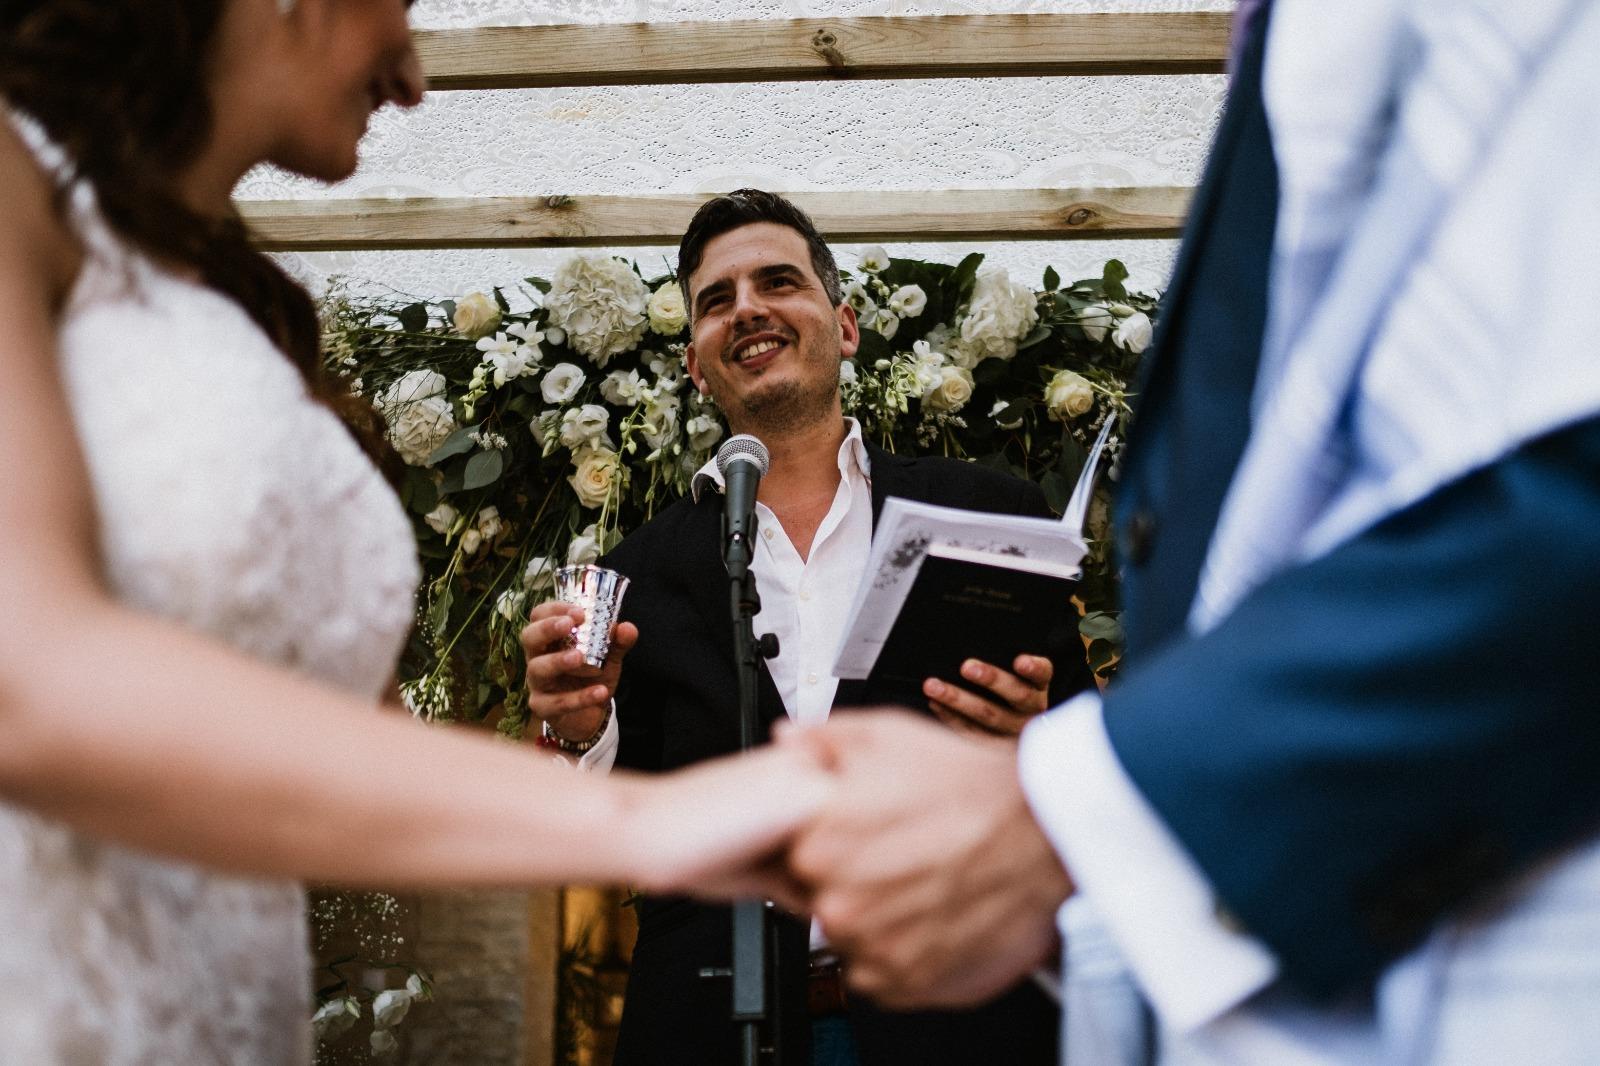 Rabbi Haim officiating a wedding ceremony in Spain